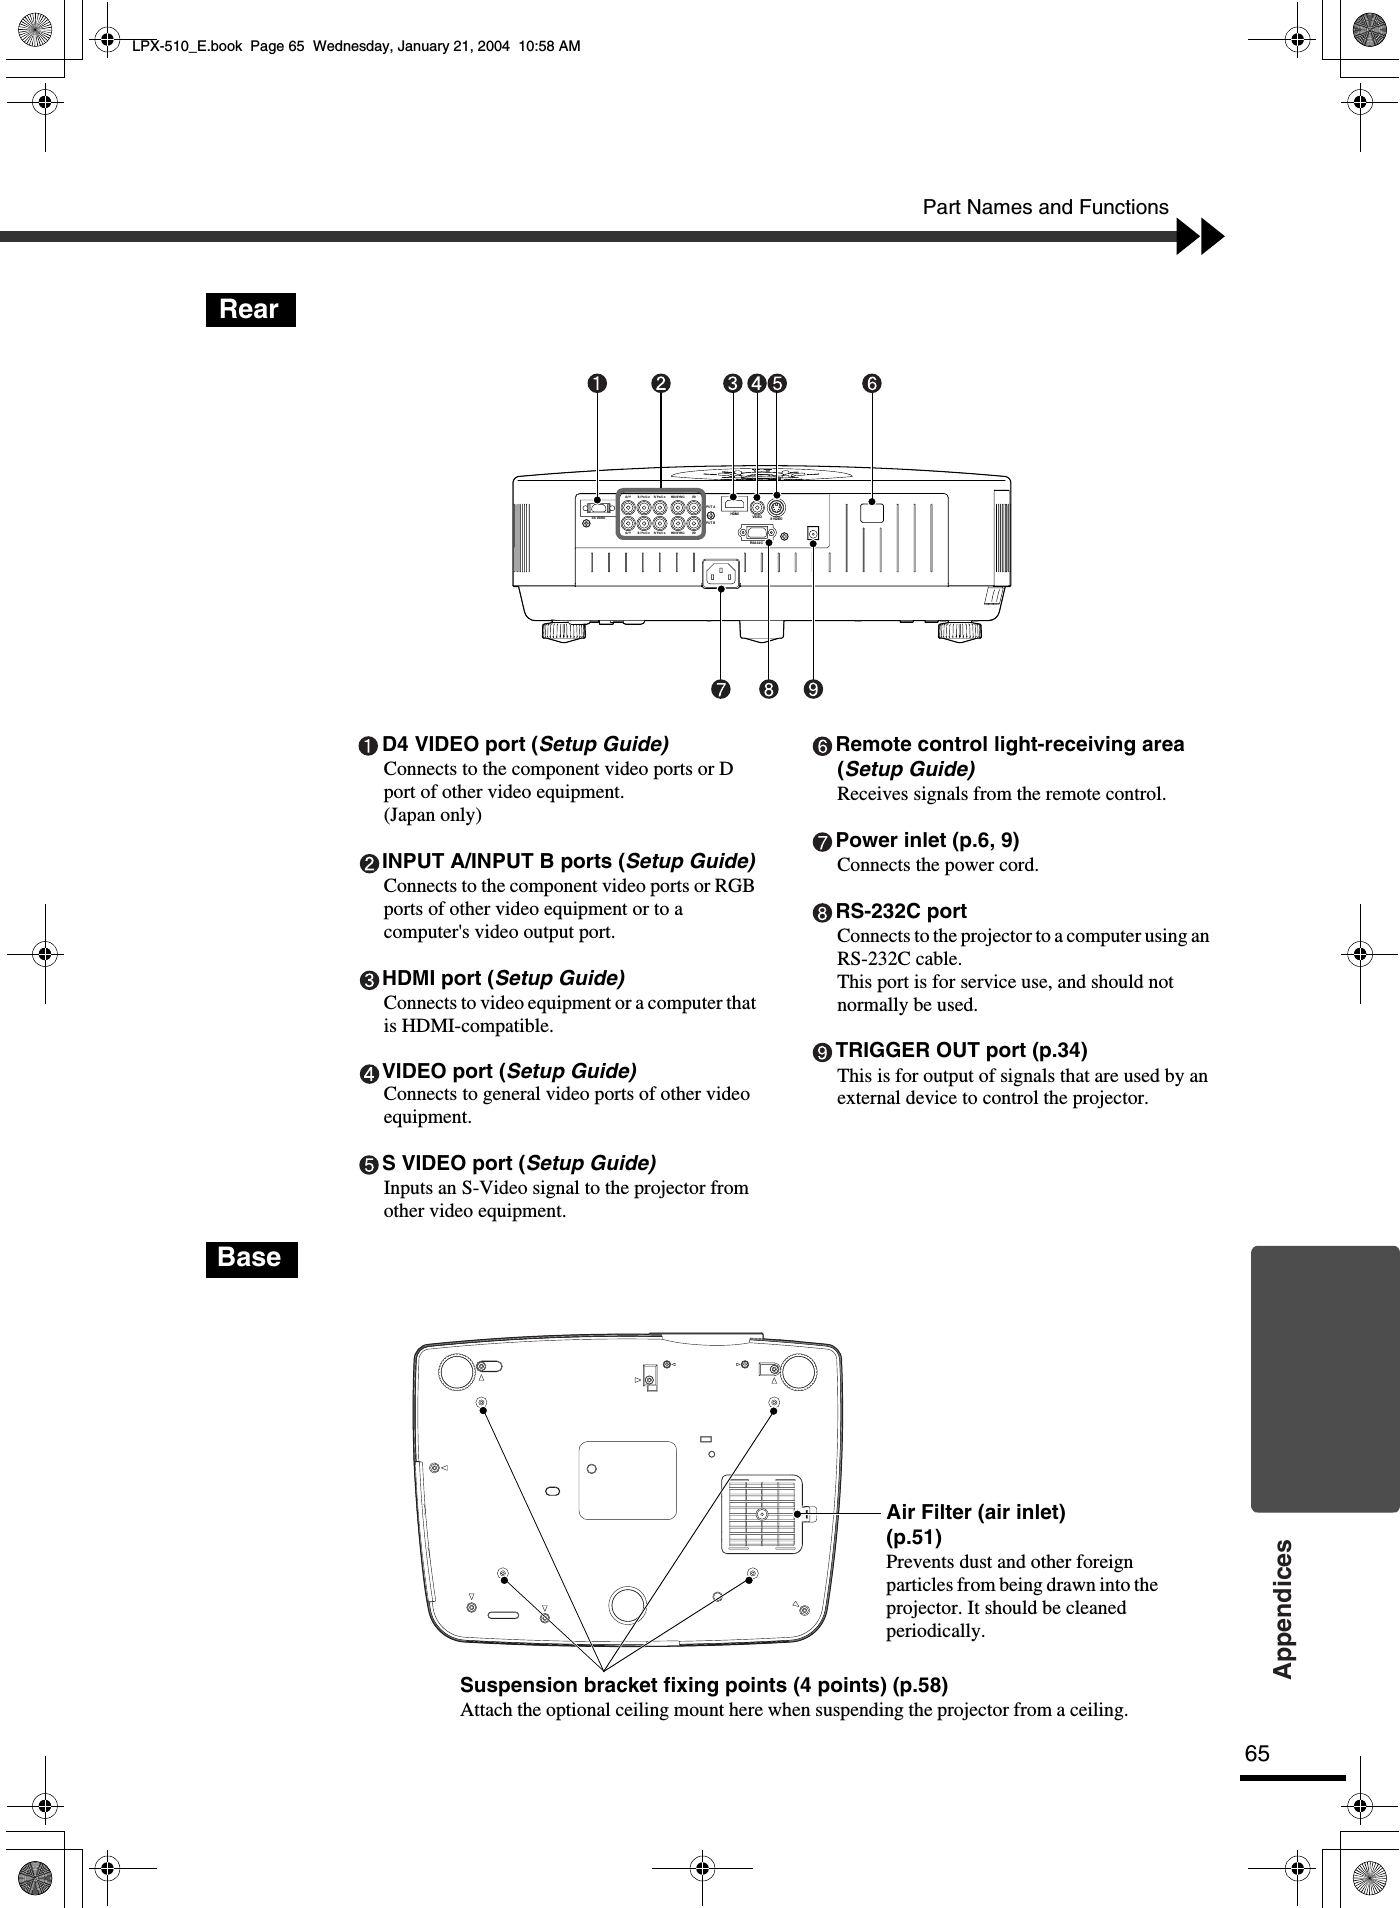 Yamaha LPX 510_E 510 Owners Manual 01 Om